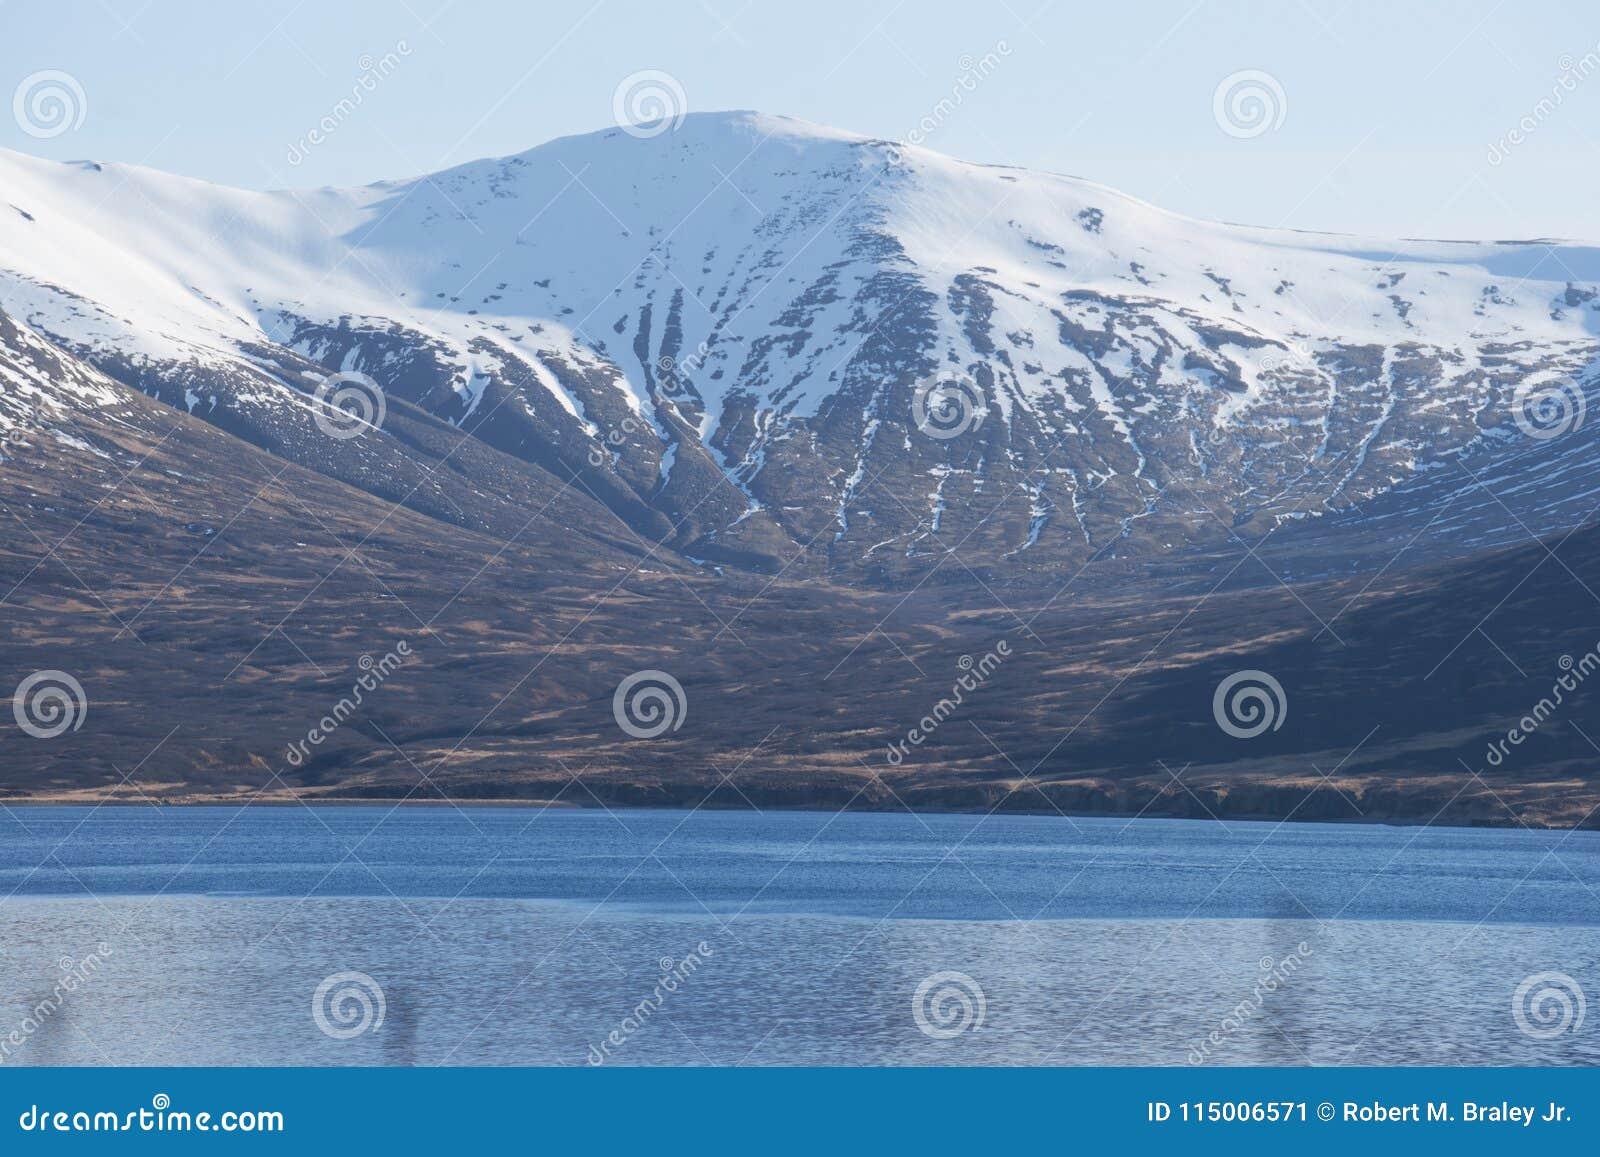 King Cove Alaska